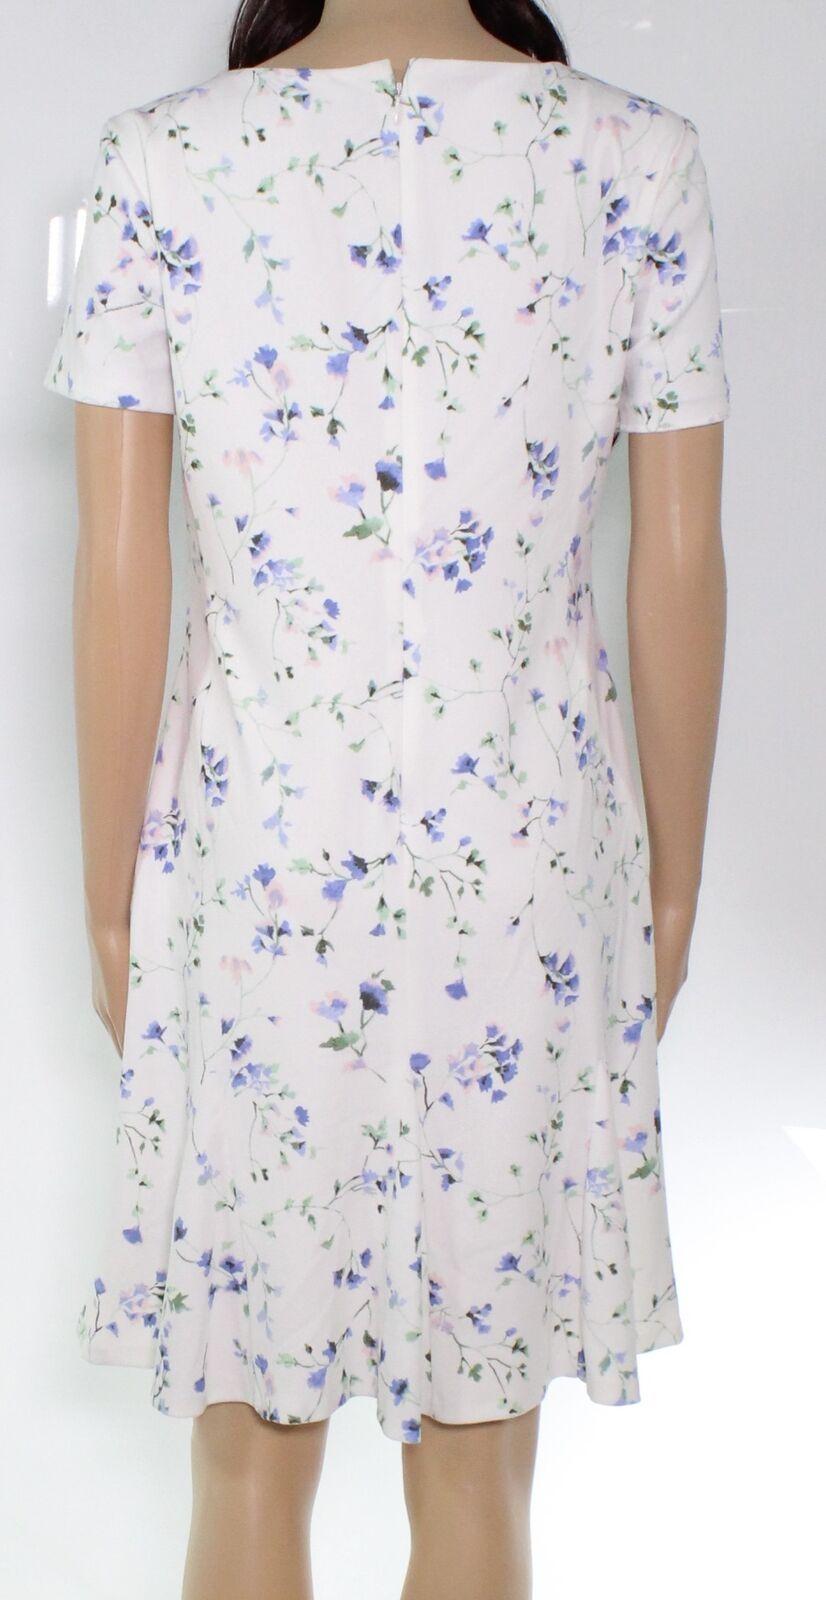 Lauren By Ralph Lauren Women's Dress White Size 12 A-Line Ditsy